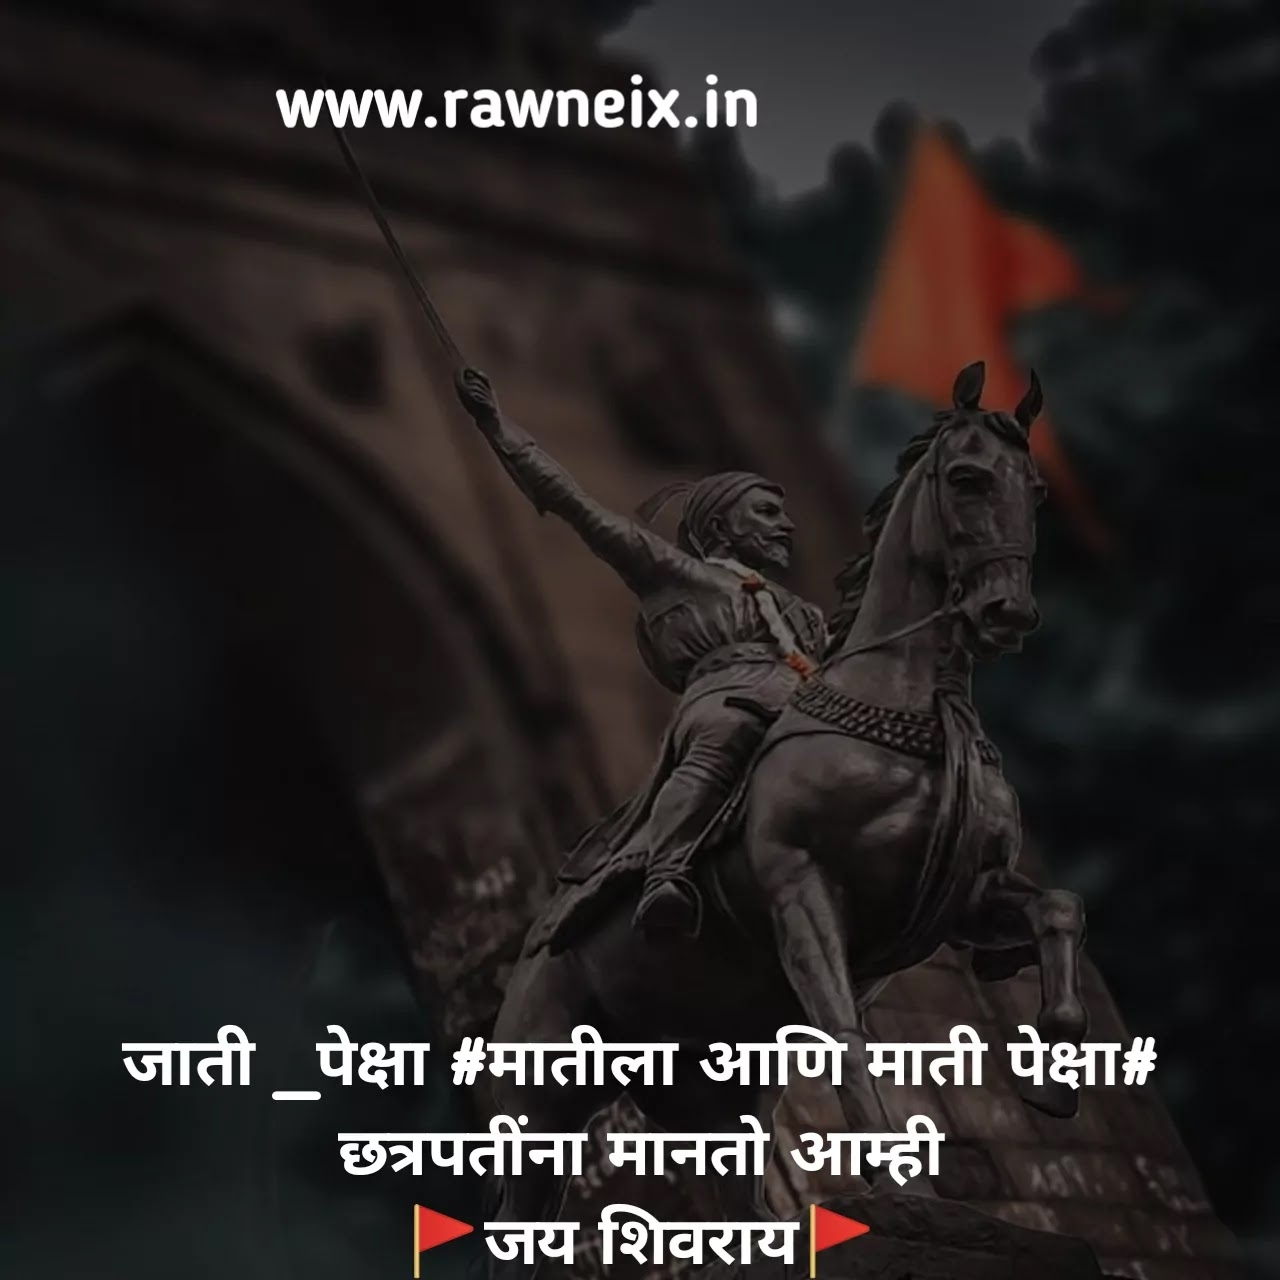 Shiv Jayanti Shubhechha In Marathi